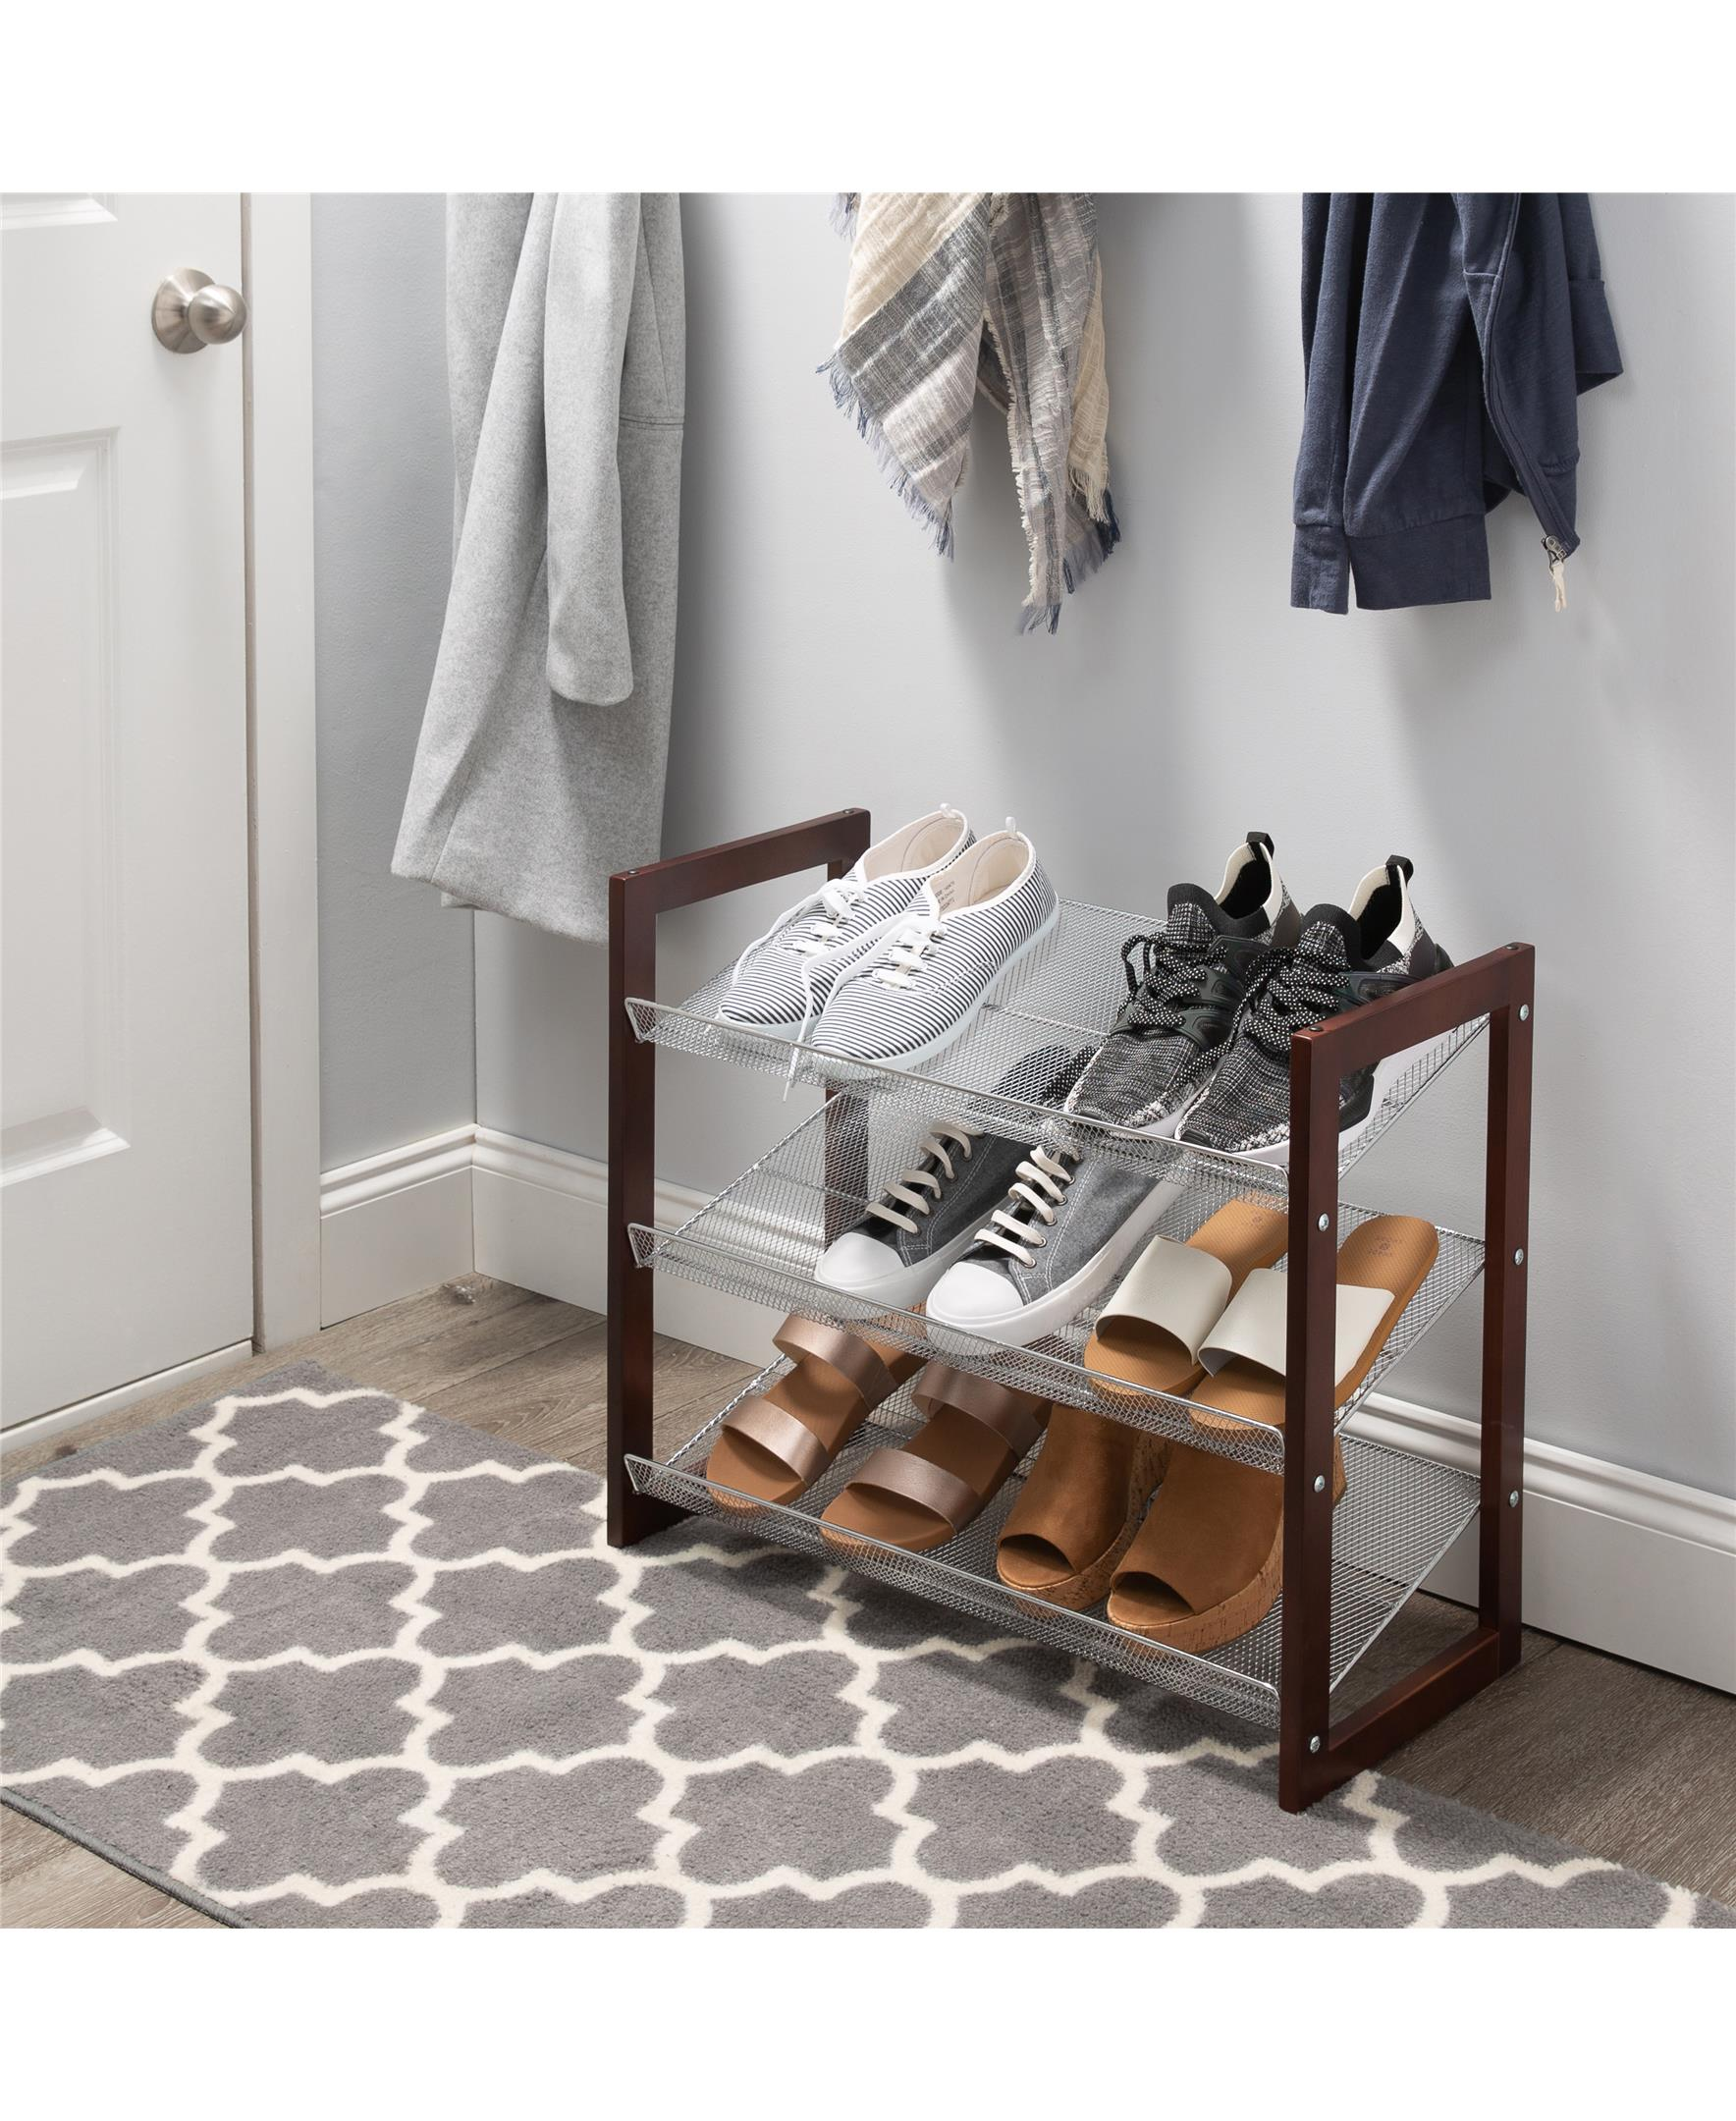 neu home 3 tier mesh shelf shoe rack in espresso